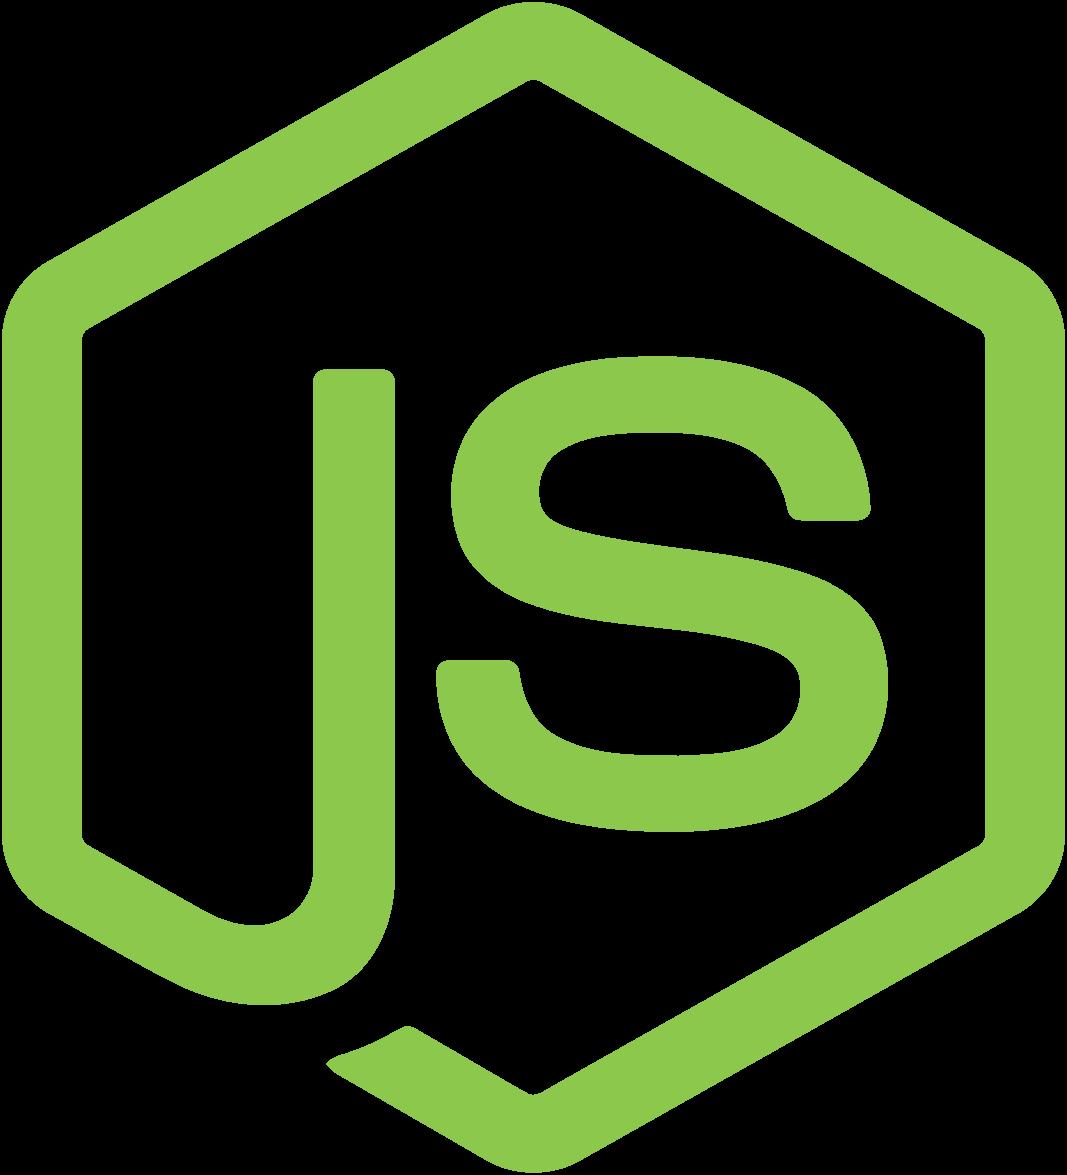 Node .js logo for node.js paragraph